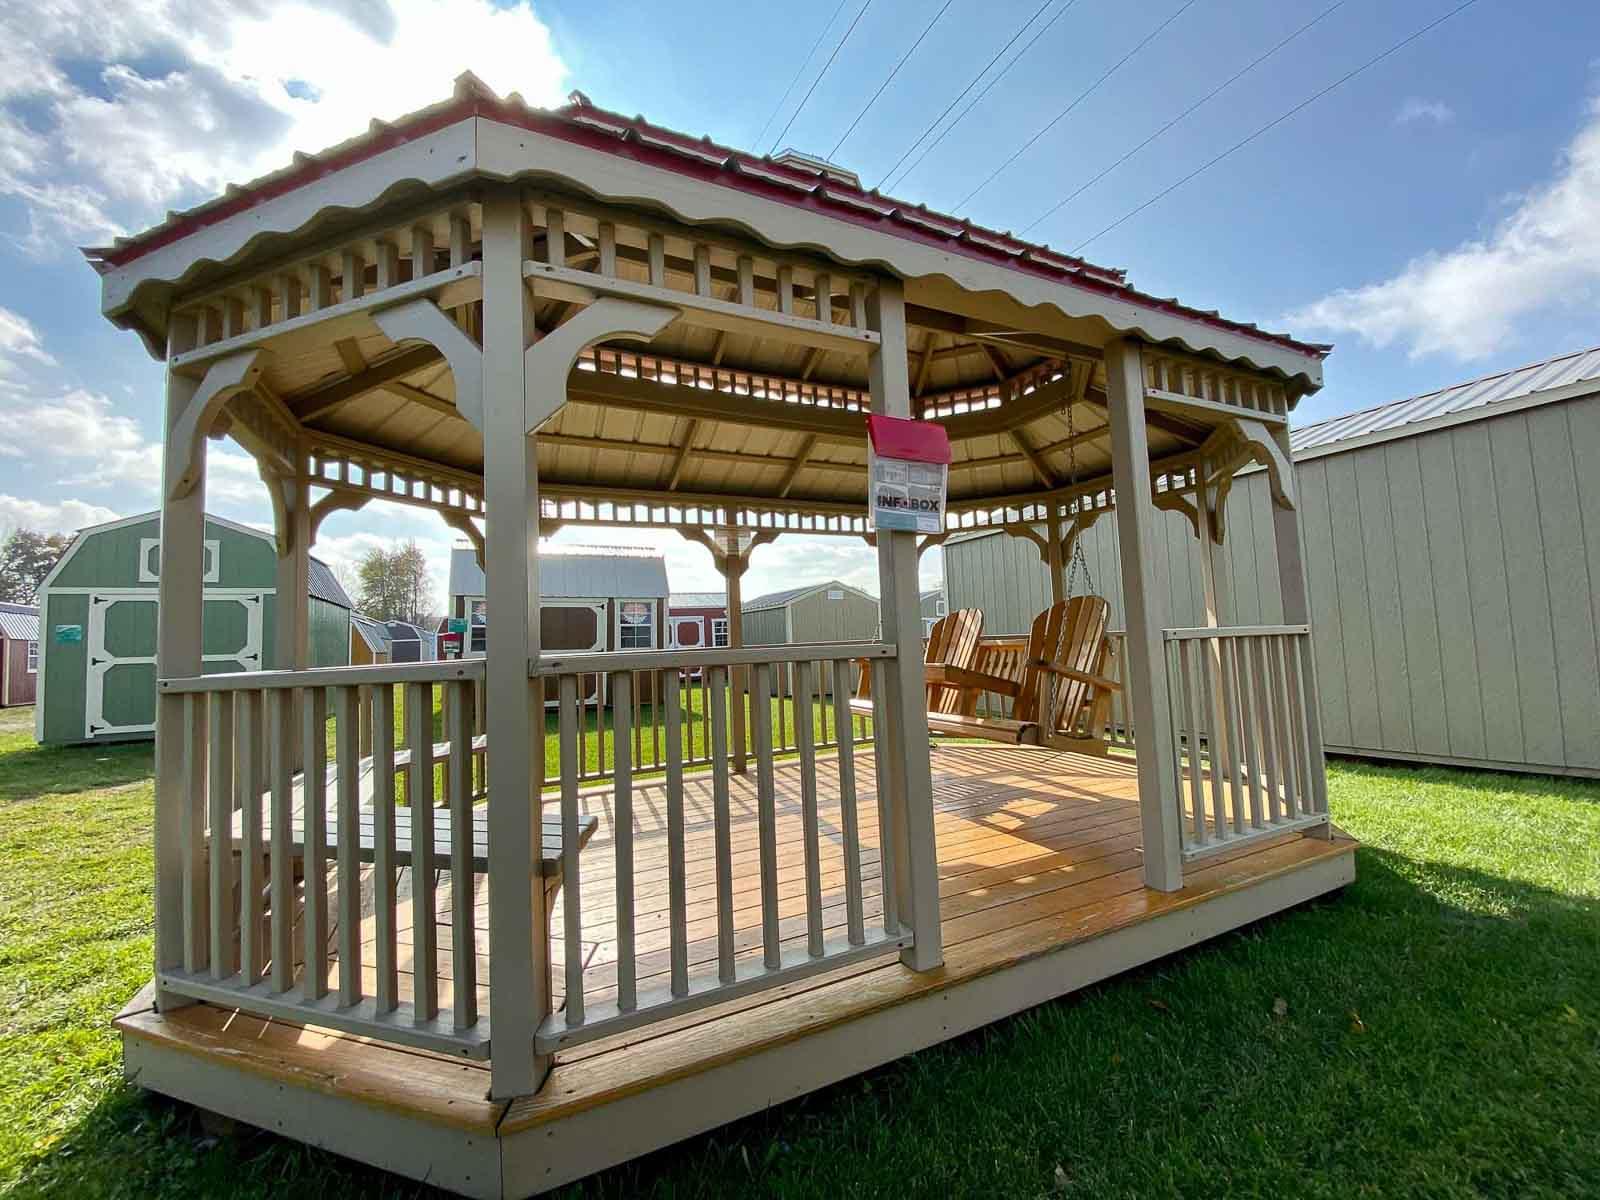 Amish Built Gazebo in Adrian Michigan